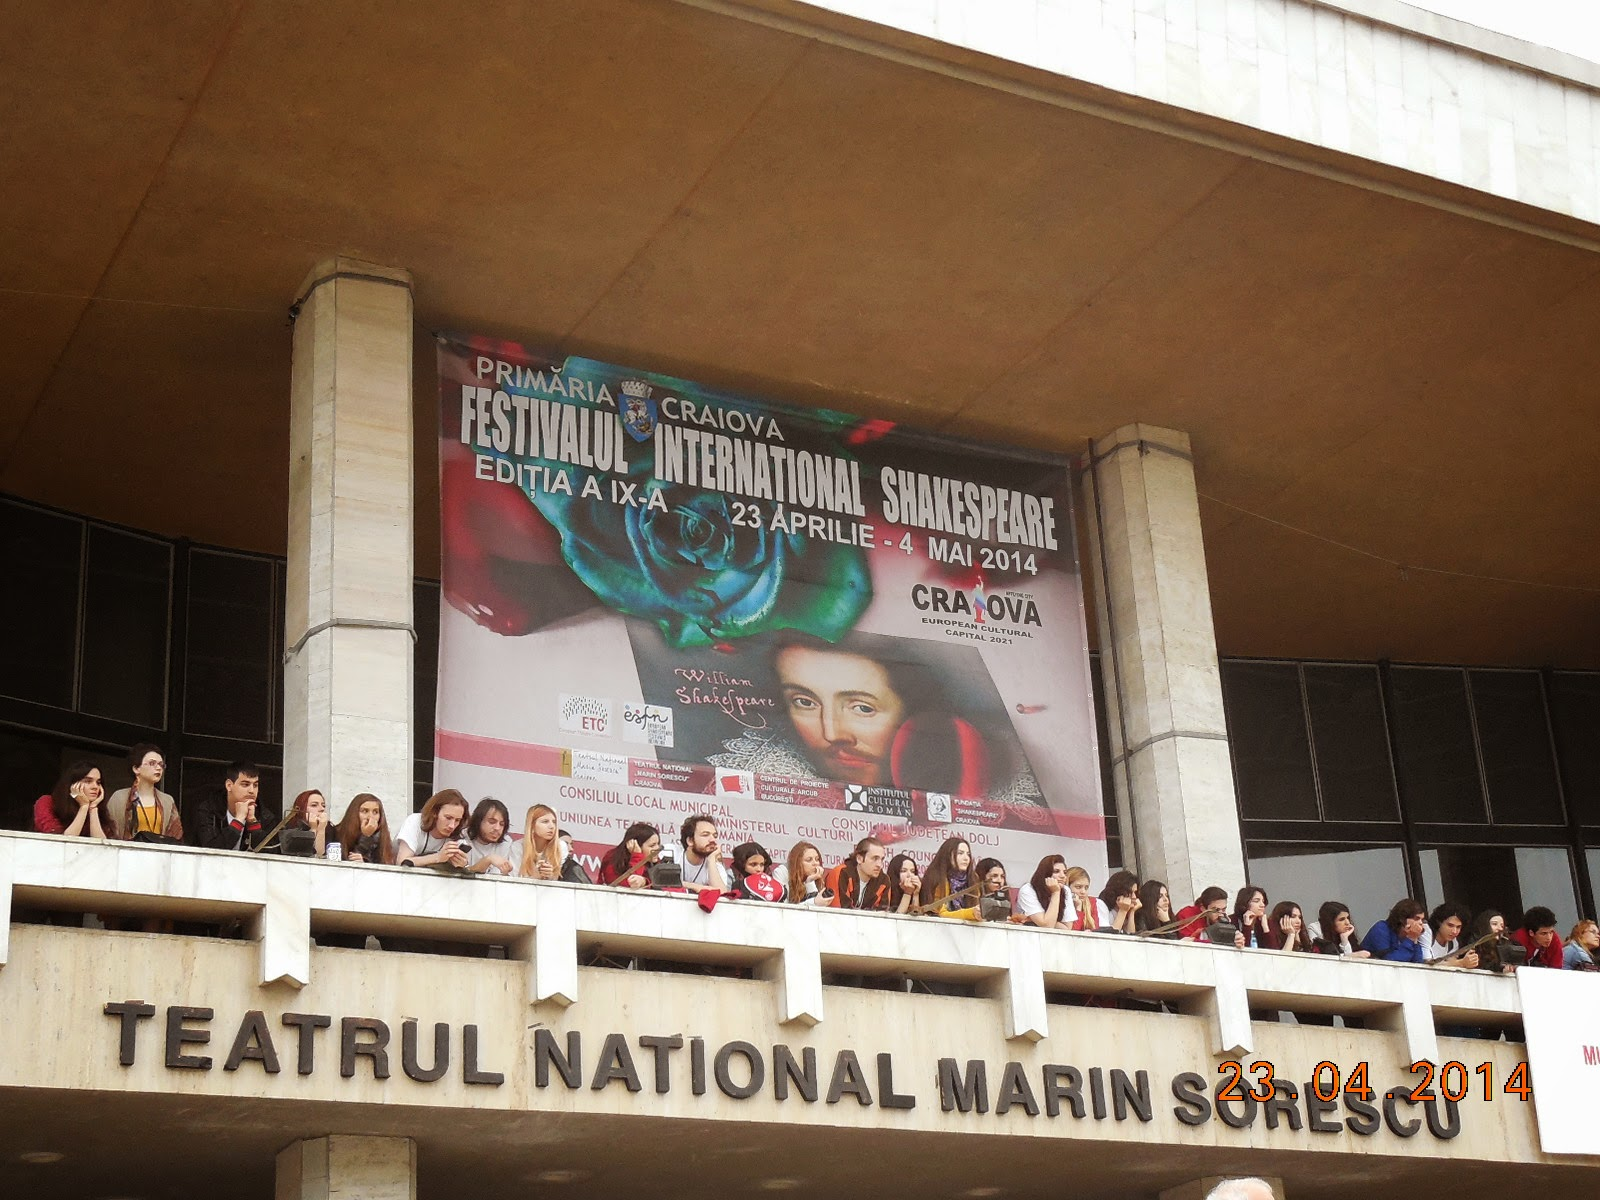 Shakespeare la Teatrul National Marin Sorescu din Craiova